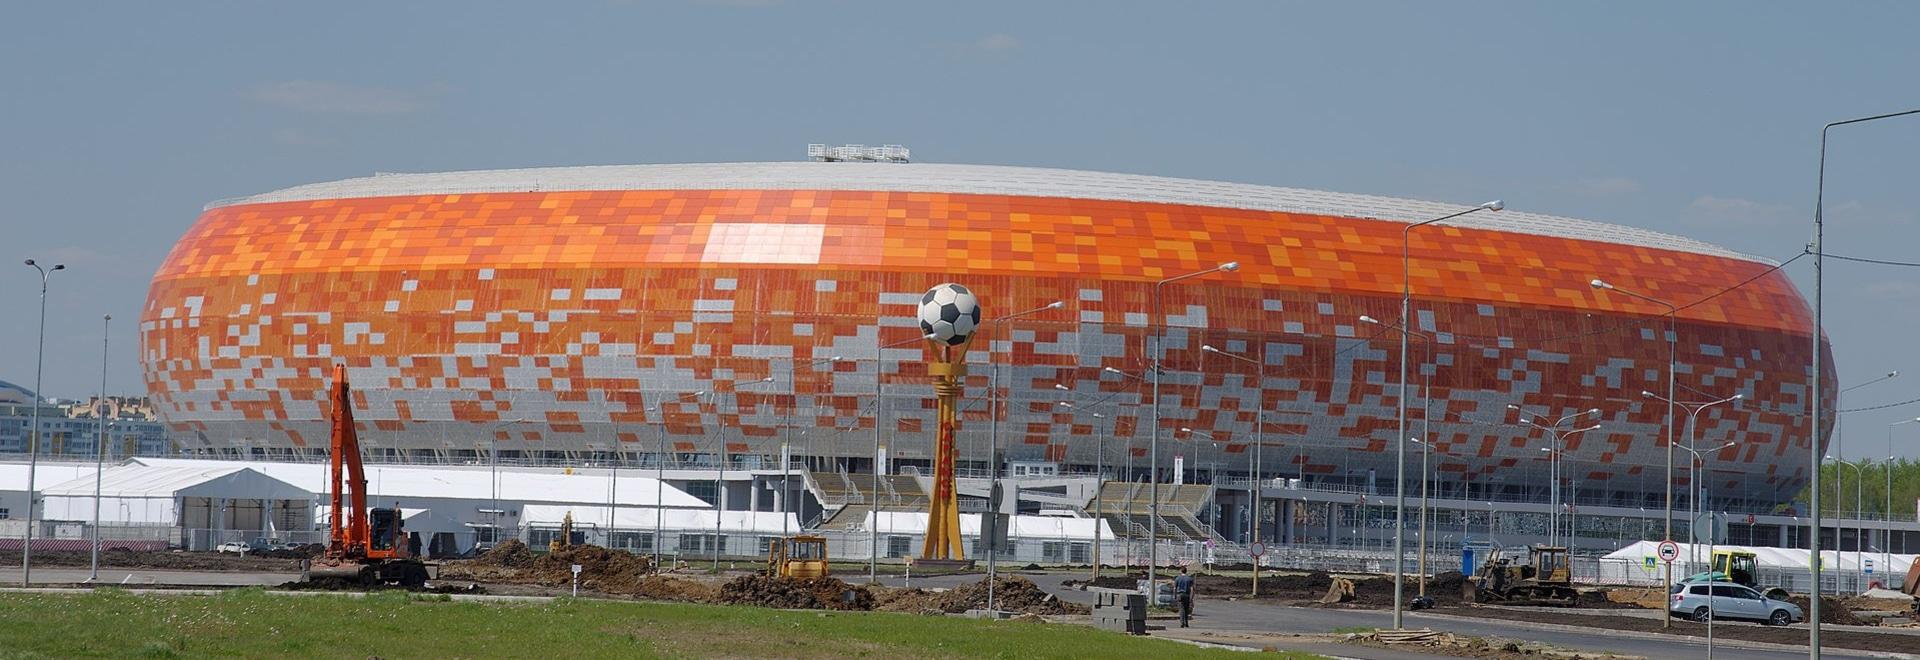 Mordovia Arena Saransk, Russia